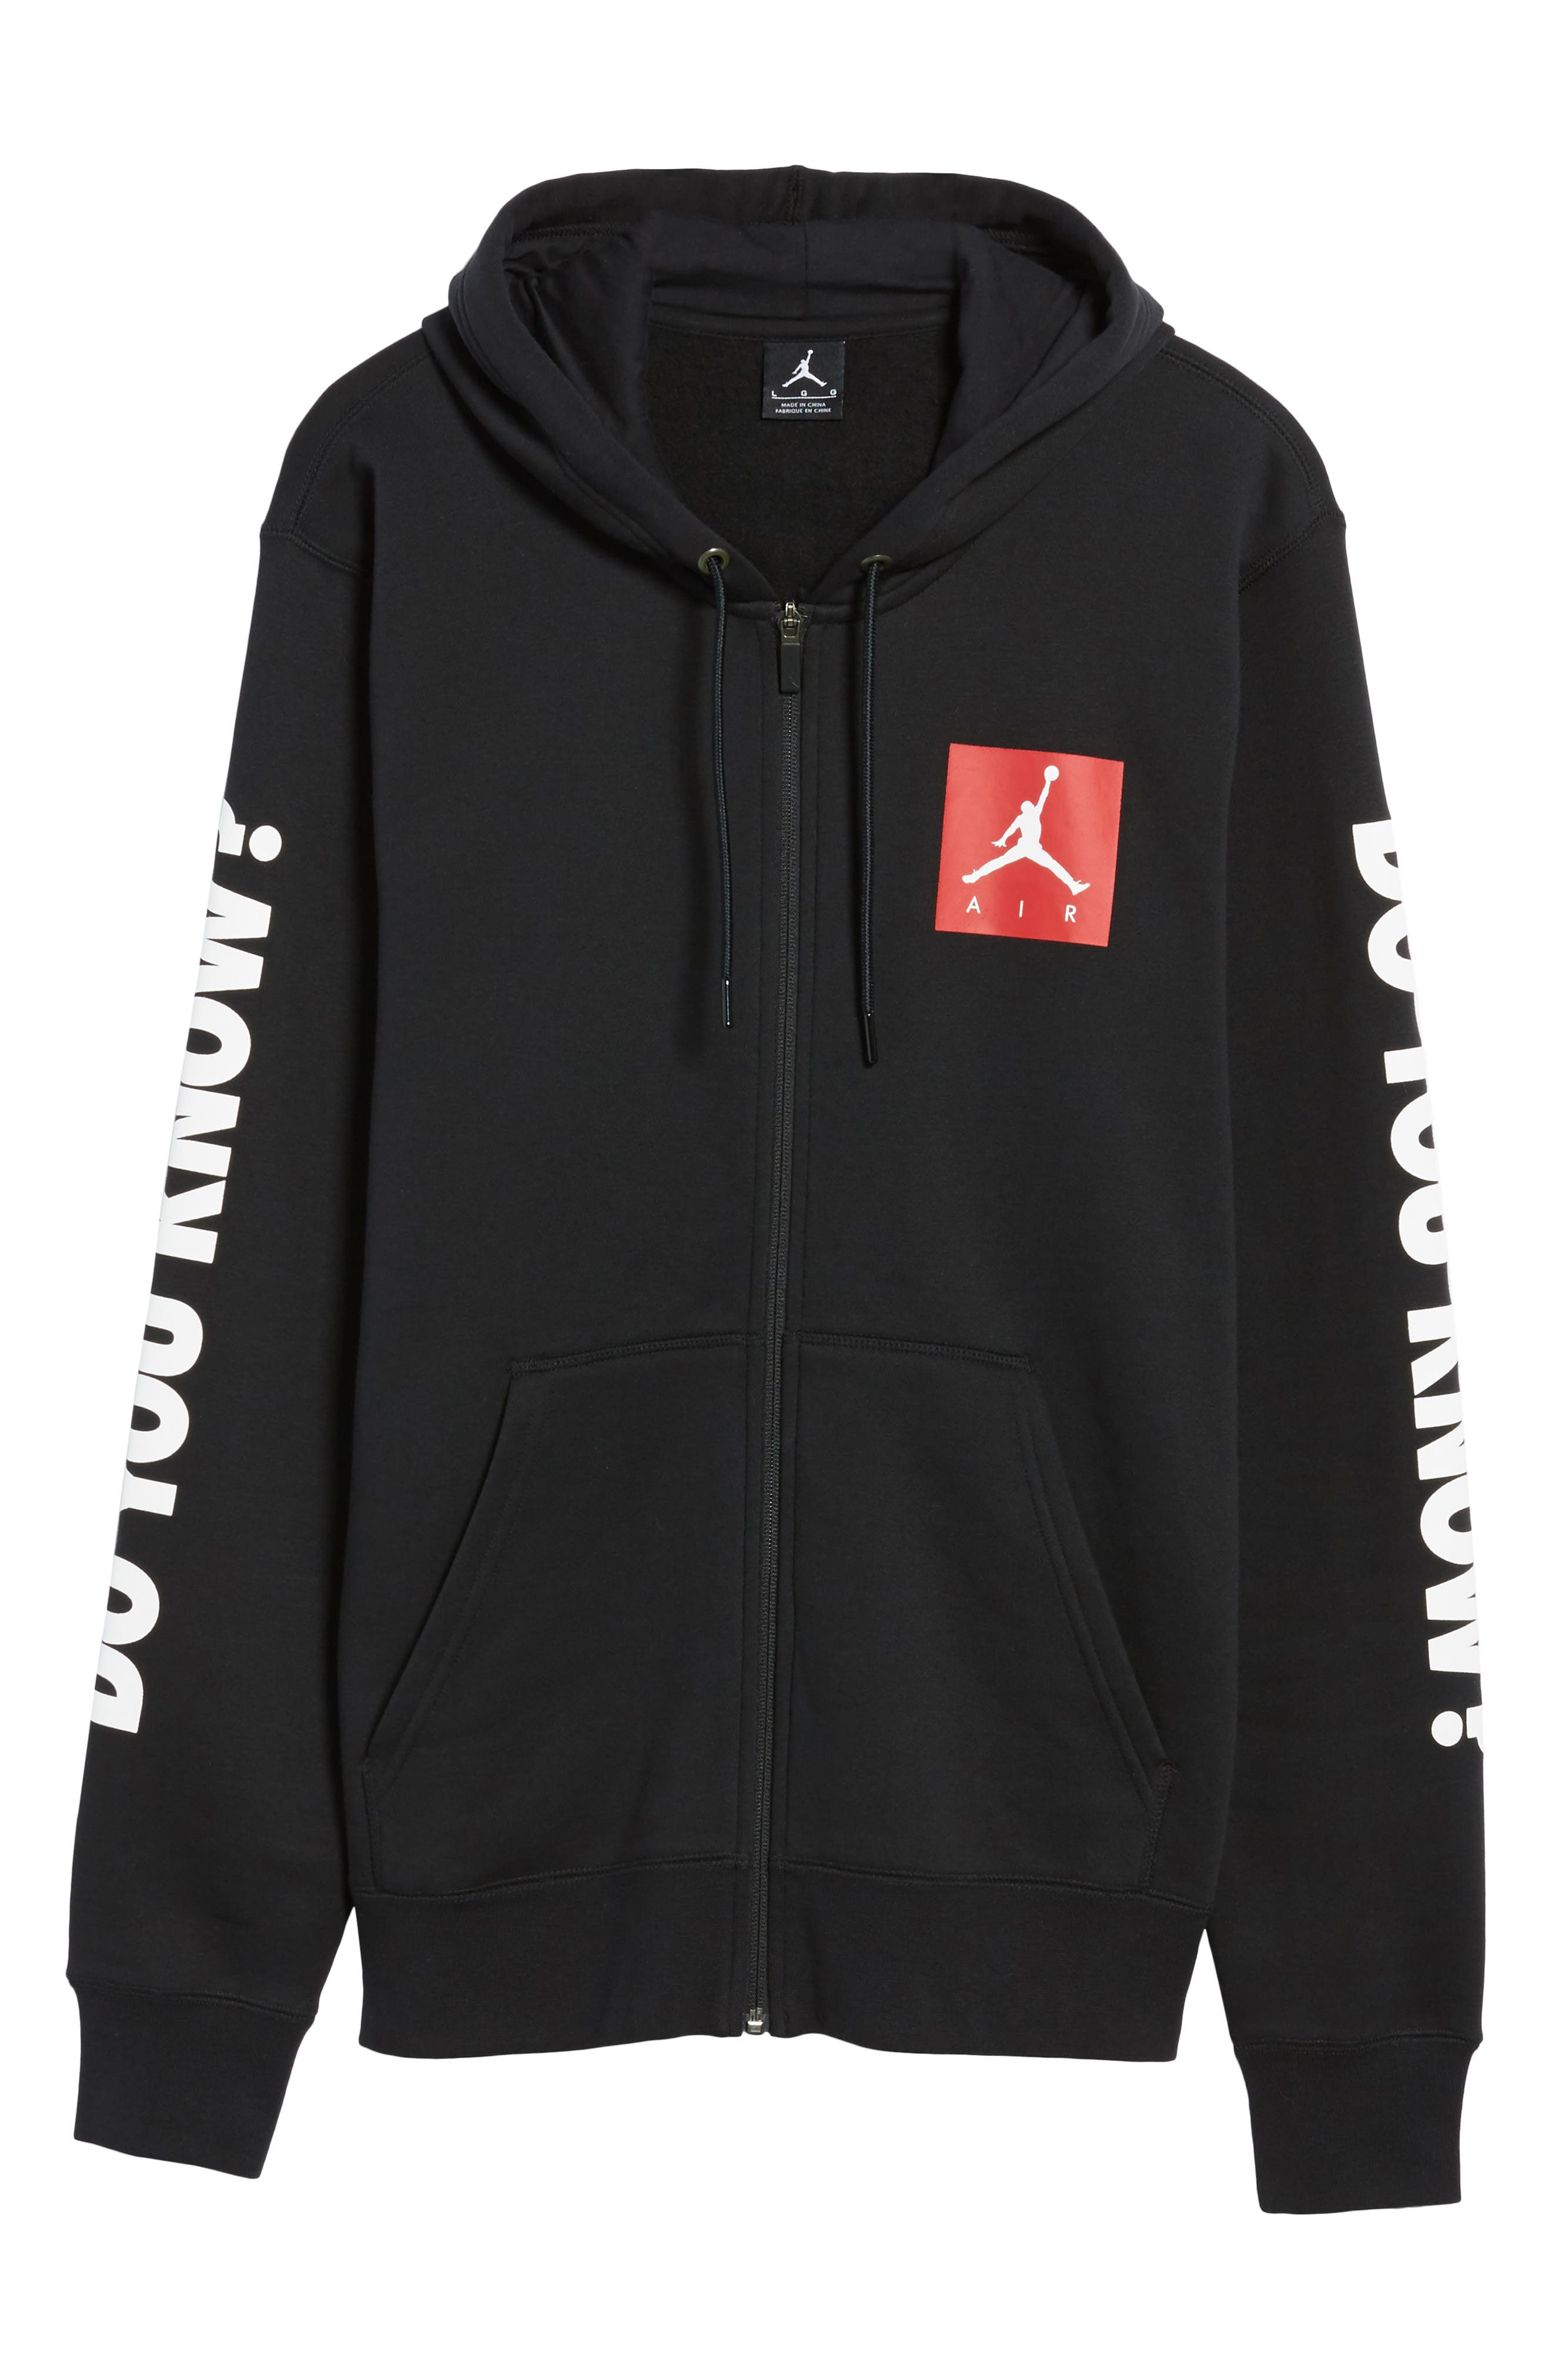 Flight Fleece AJ3 Zip Hoodie,                             Alternate thumbnail 6, color,                             Black/ Gym Red/ White